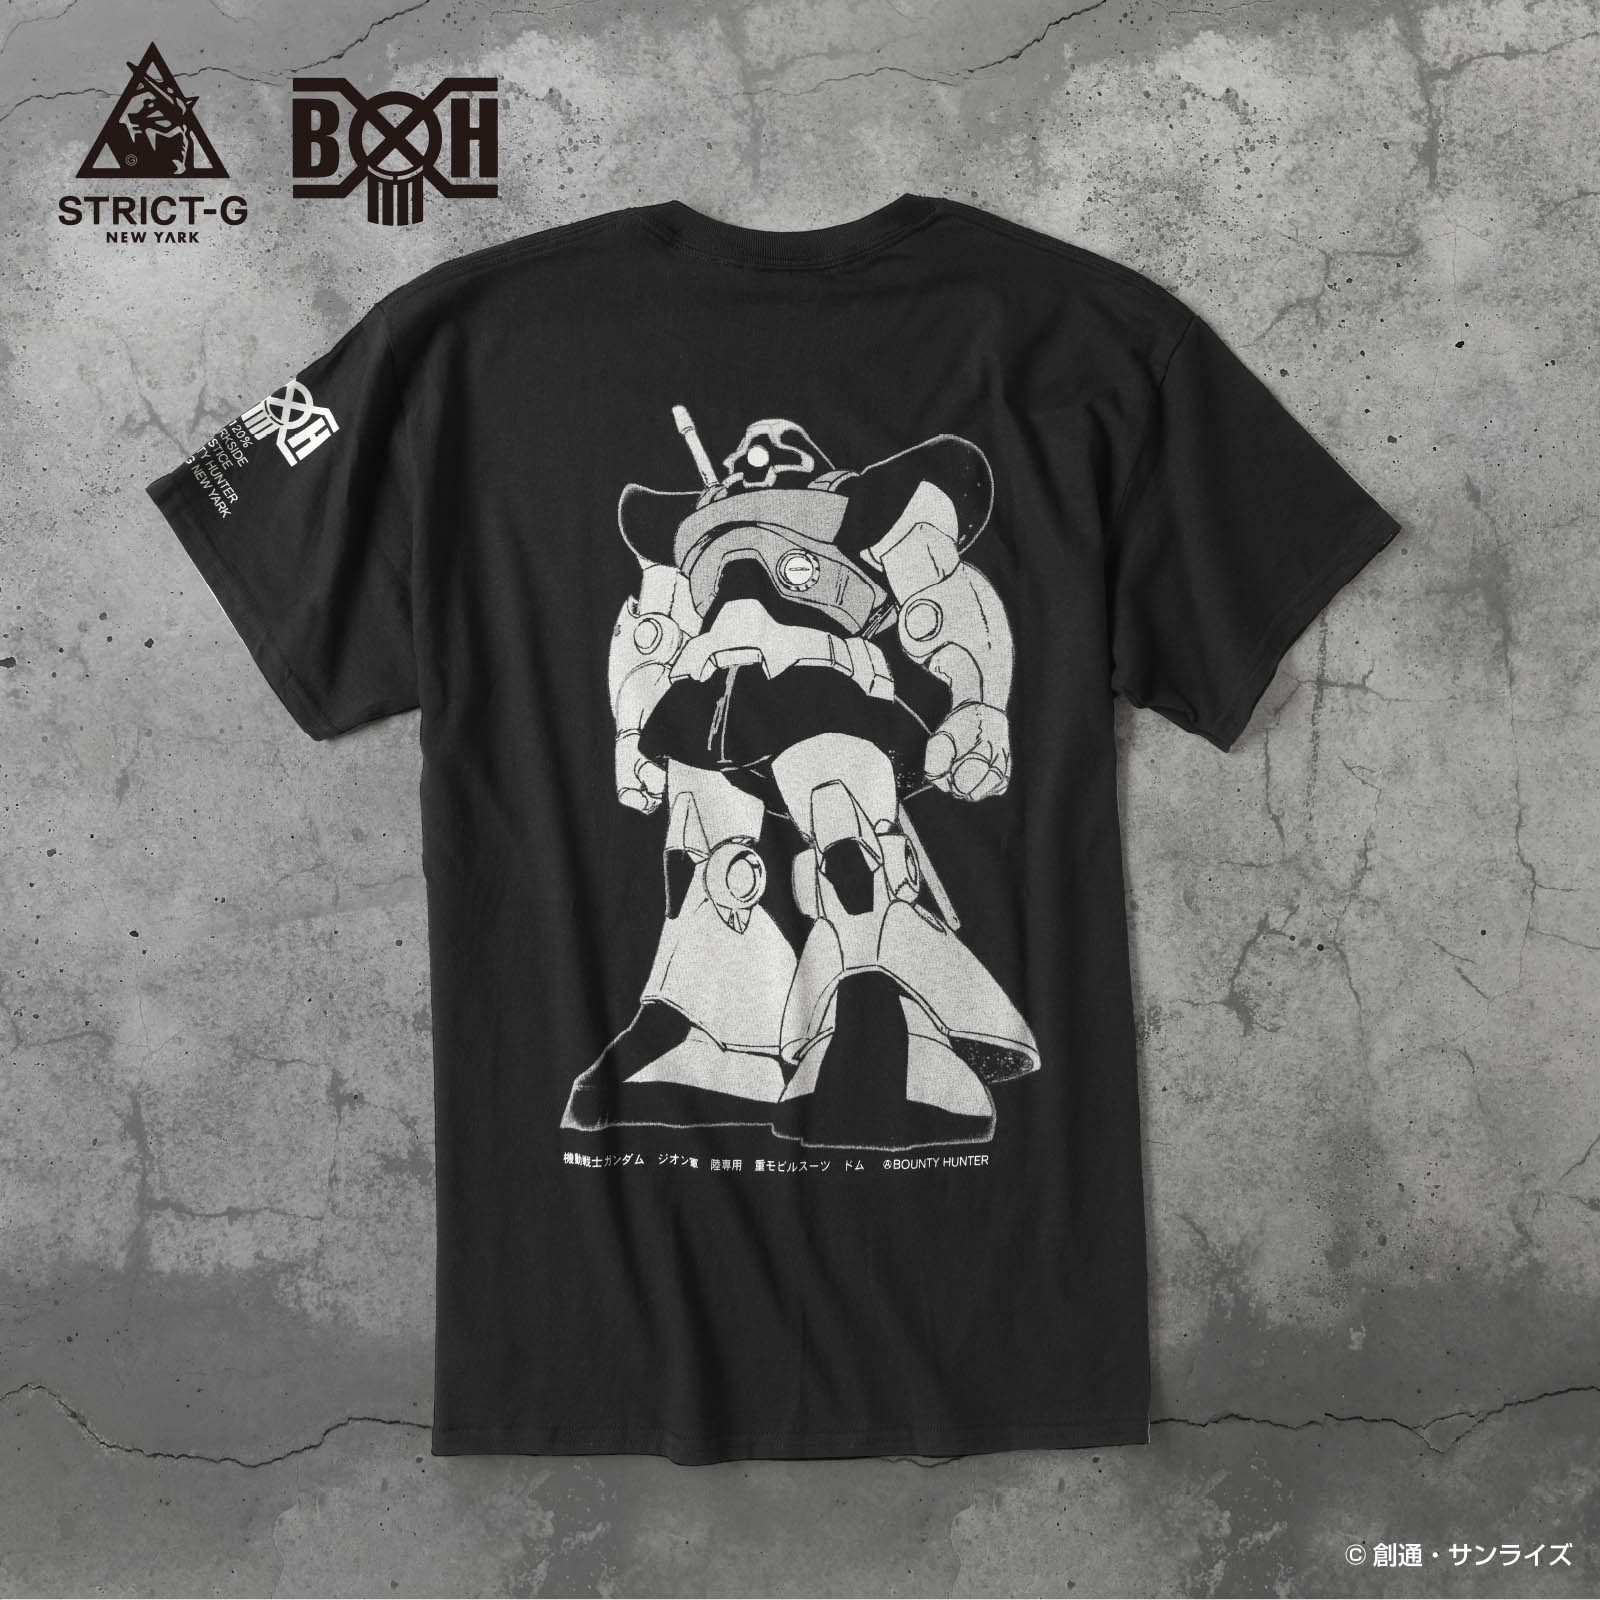 STRICT-G NEW YARK × BOUNTY HUNTER ドムTシャツ